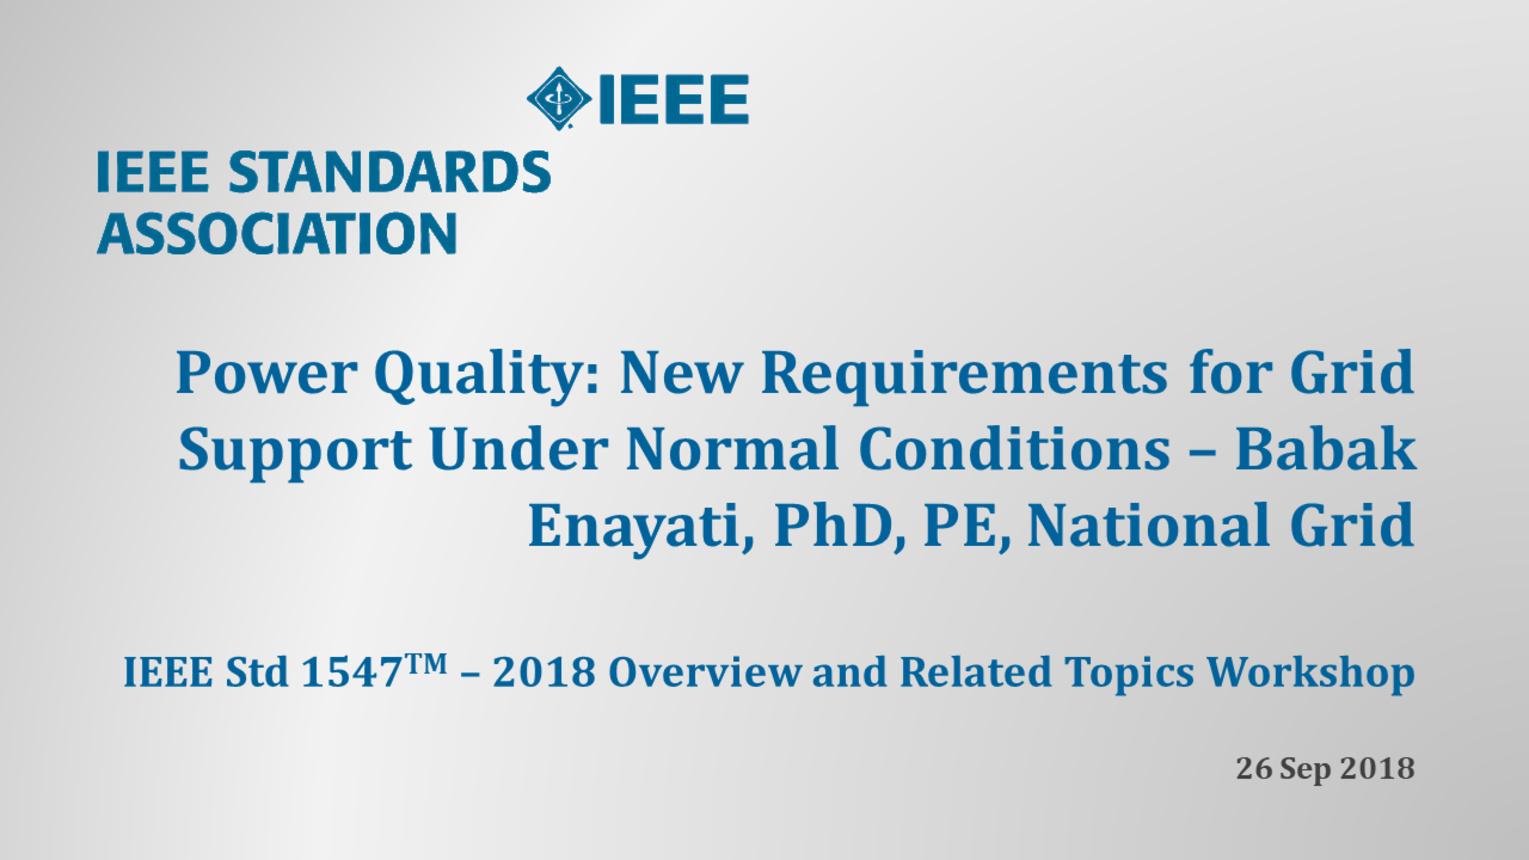 IEEE Std 1547 Workshop - NERC - Atlanta, GA - Sept. 2018: Power Quality - Babak Enayati